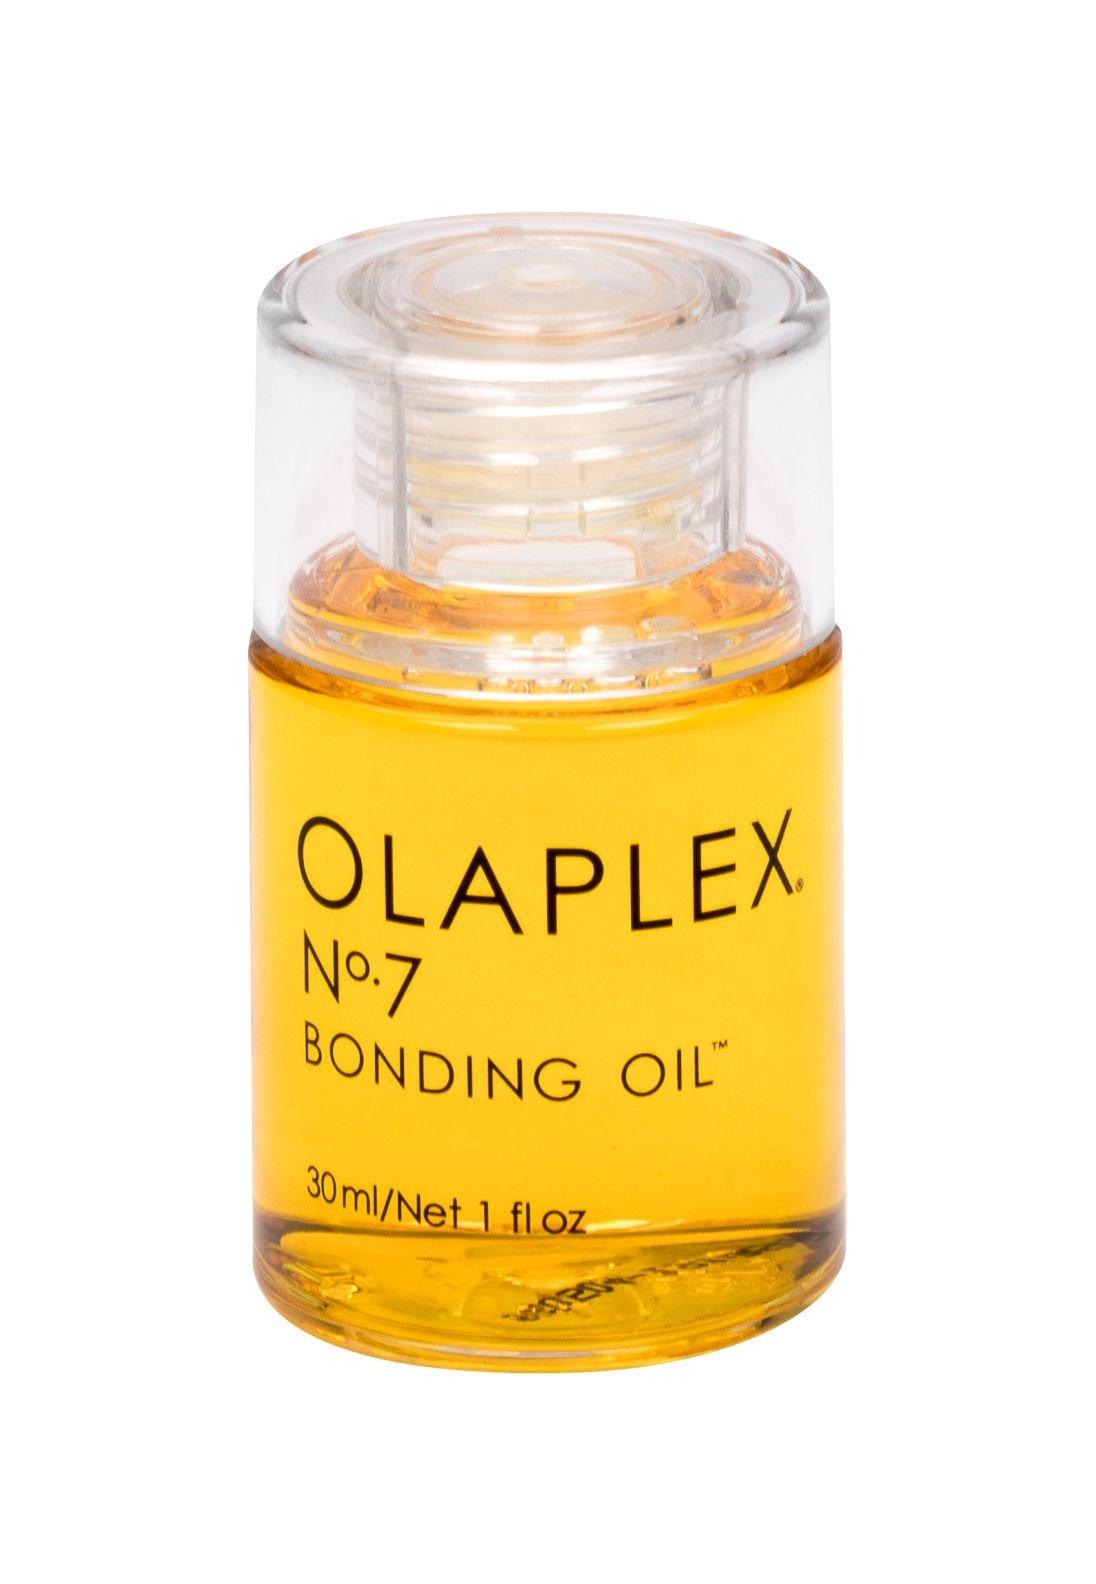 Olaplex Bonding Oil Hair Oils and Serum 30ml